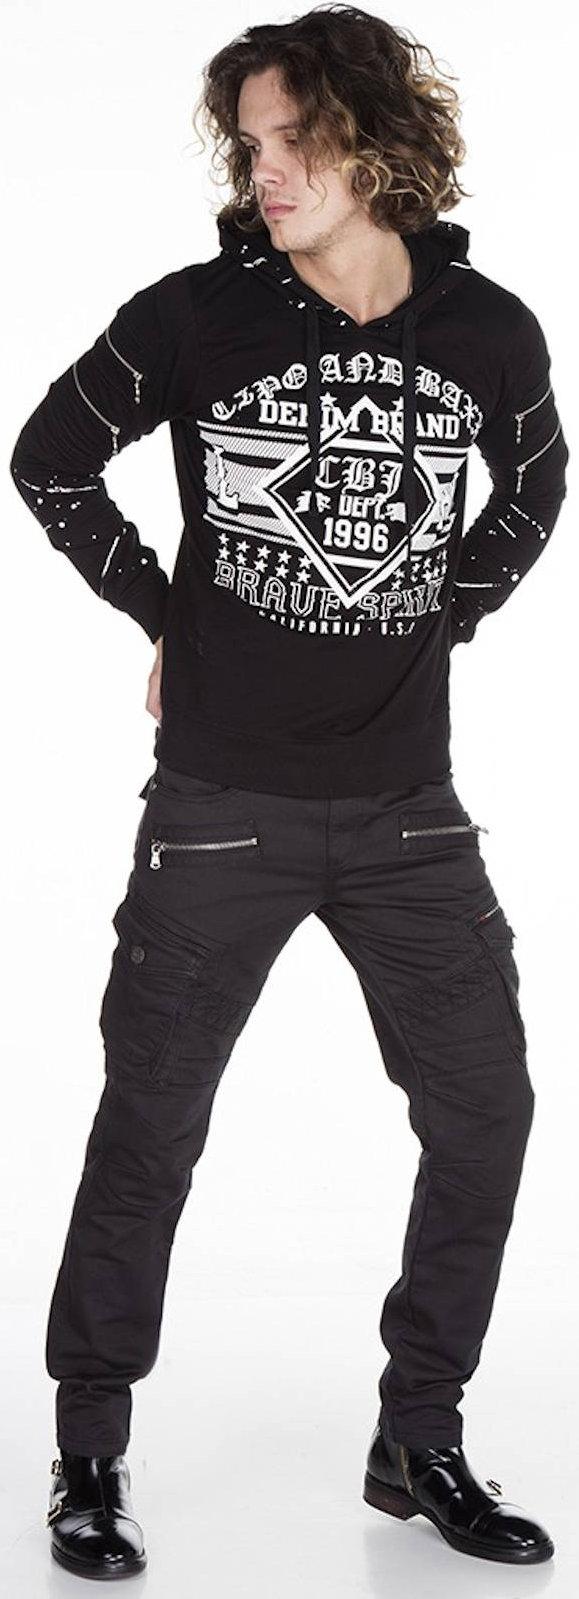 CIPO /& Baxx Hommes Jeans cd424 pantalon Straight cut regular précisément denim stretch